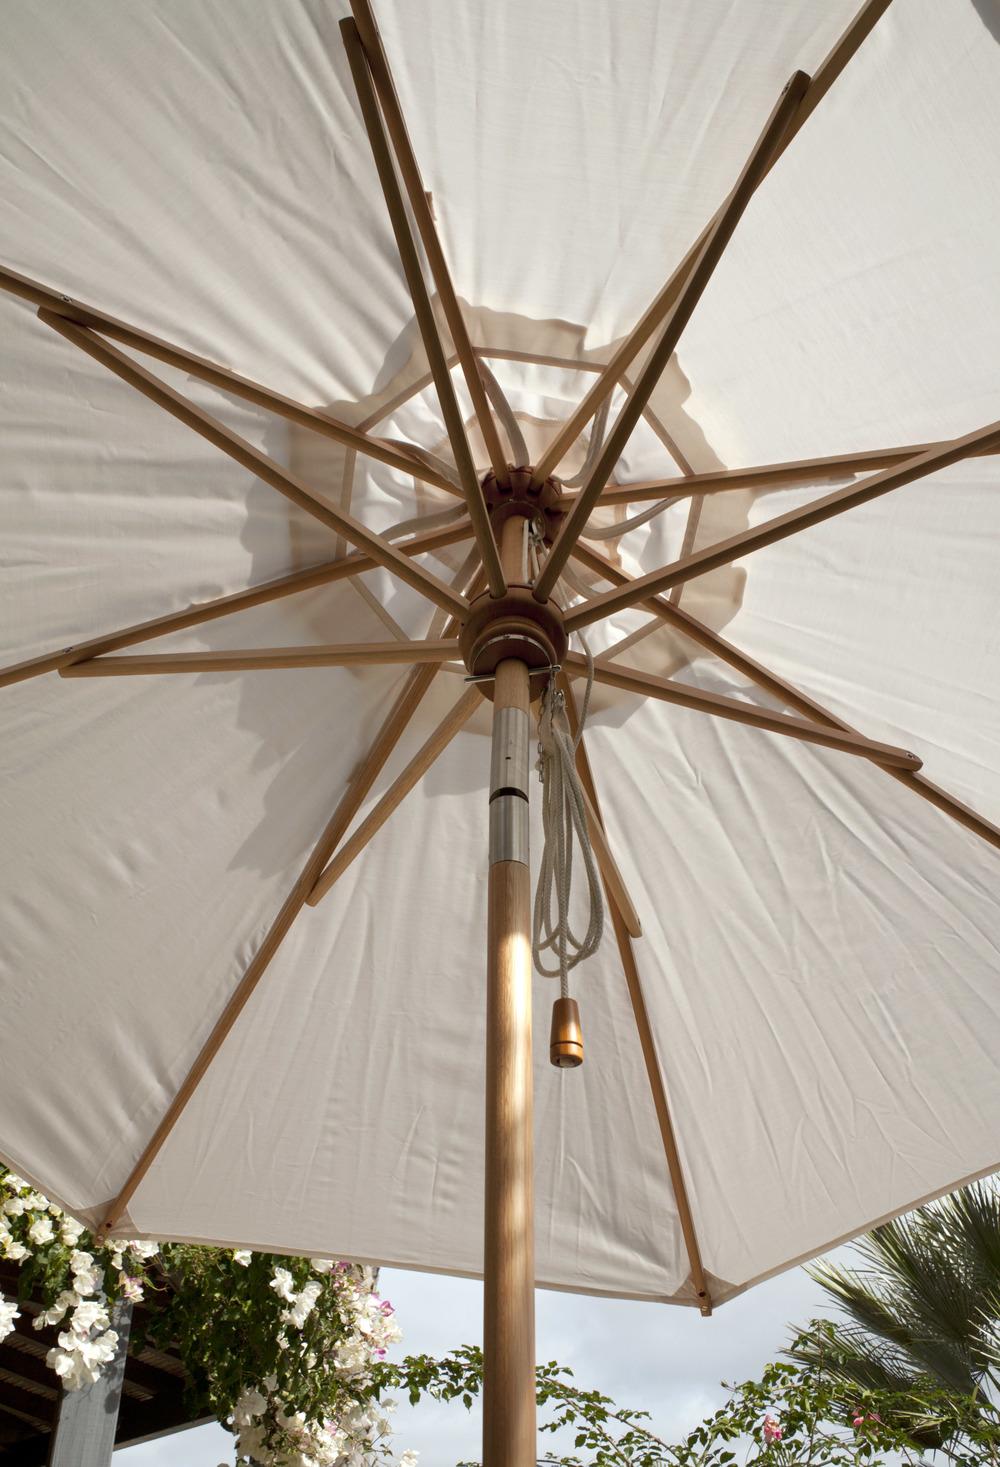 Barlow Tyrie - Napoli Circular Parasol with Tilt